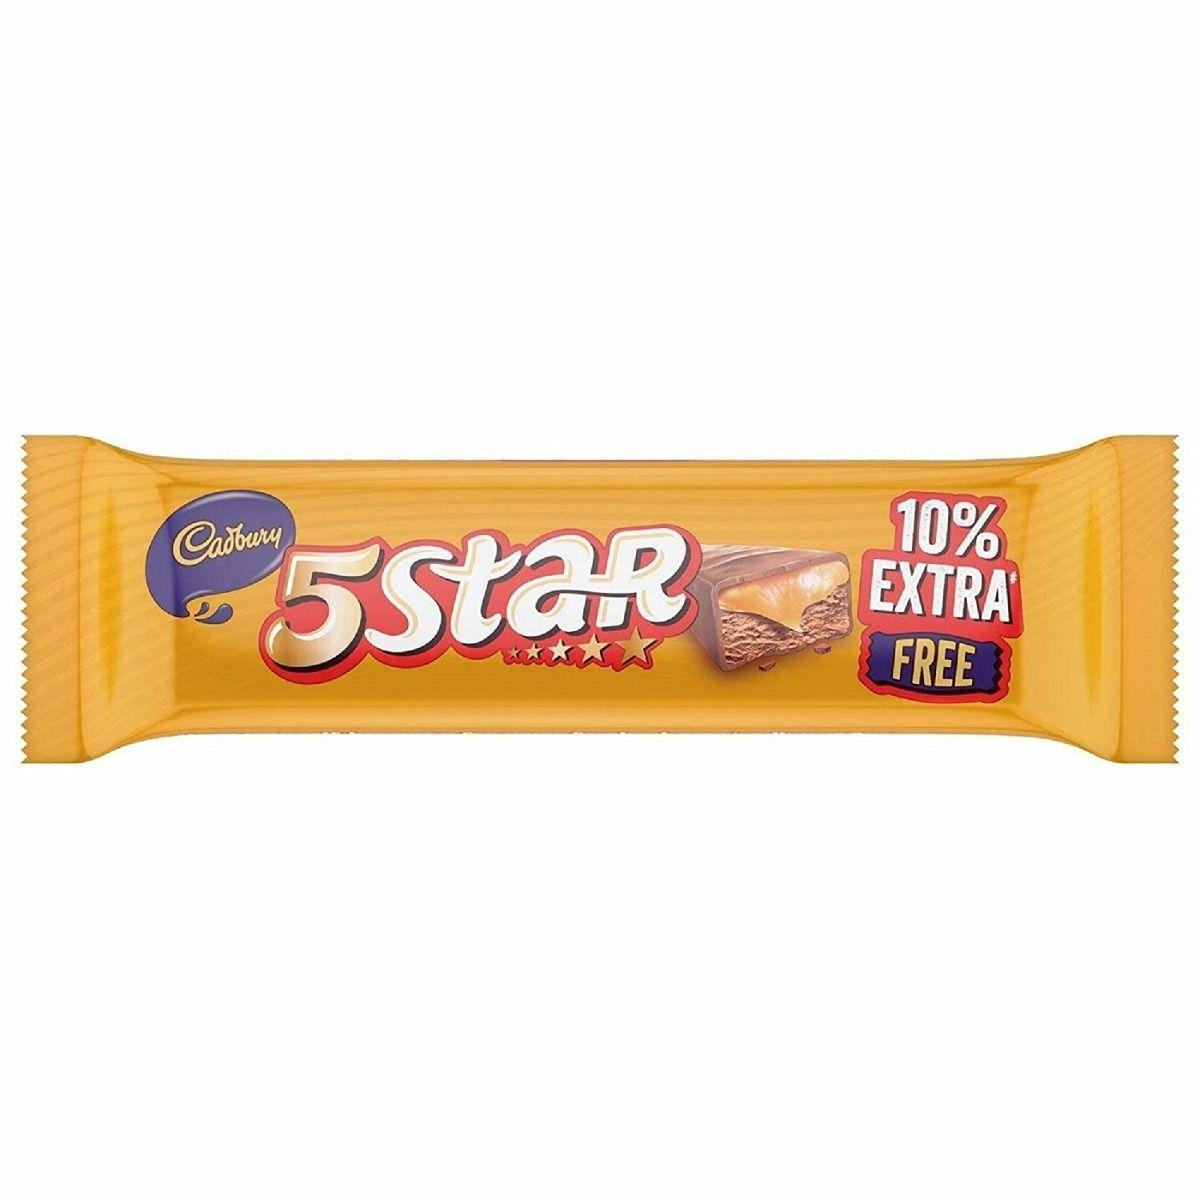 Cadbury 5 Star Chocolate Bar, 11.1 gm